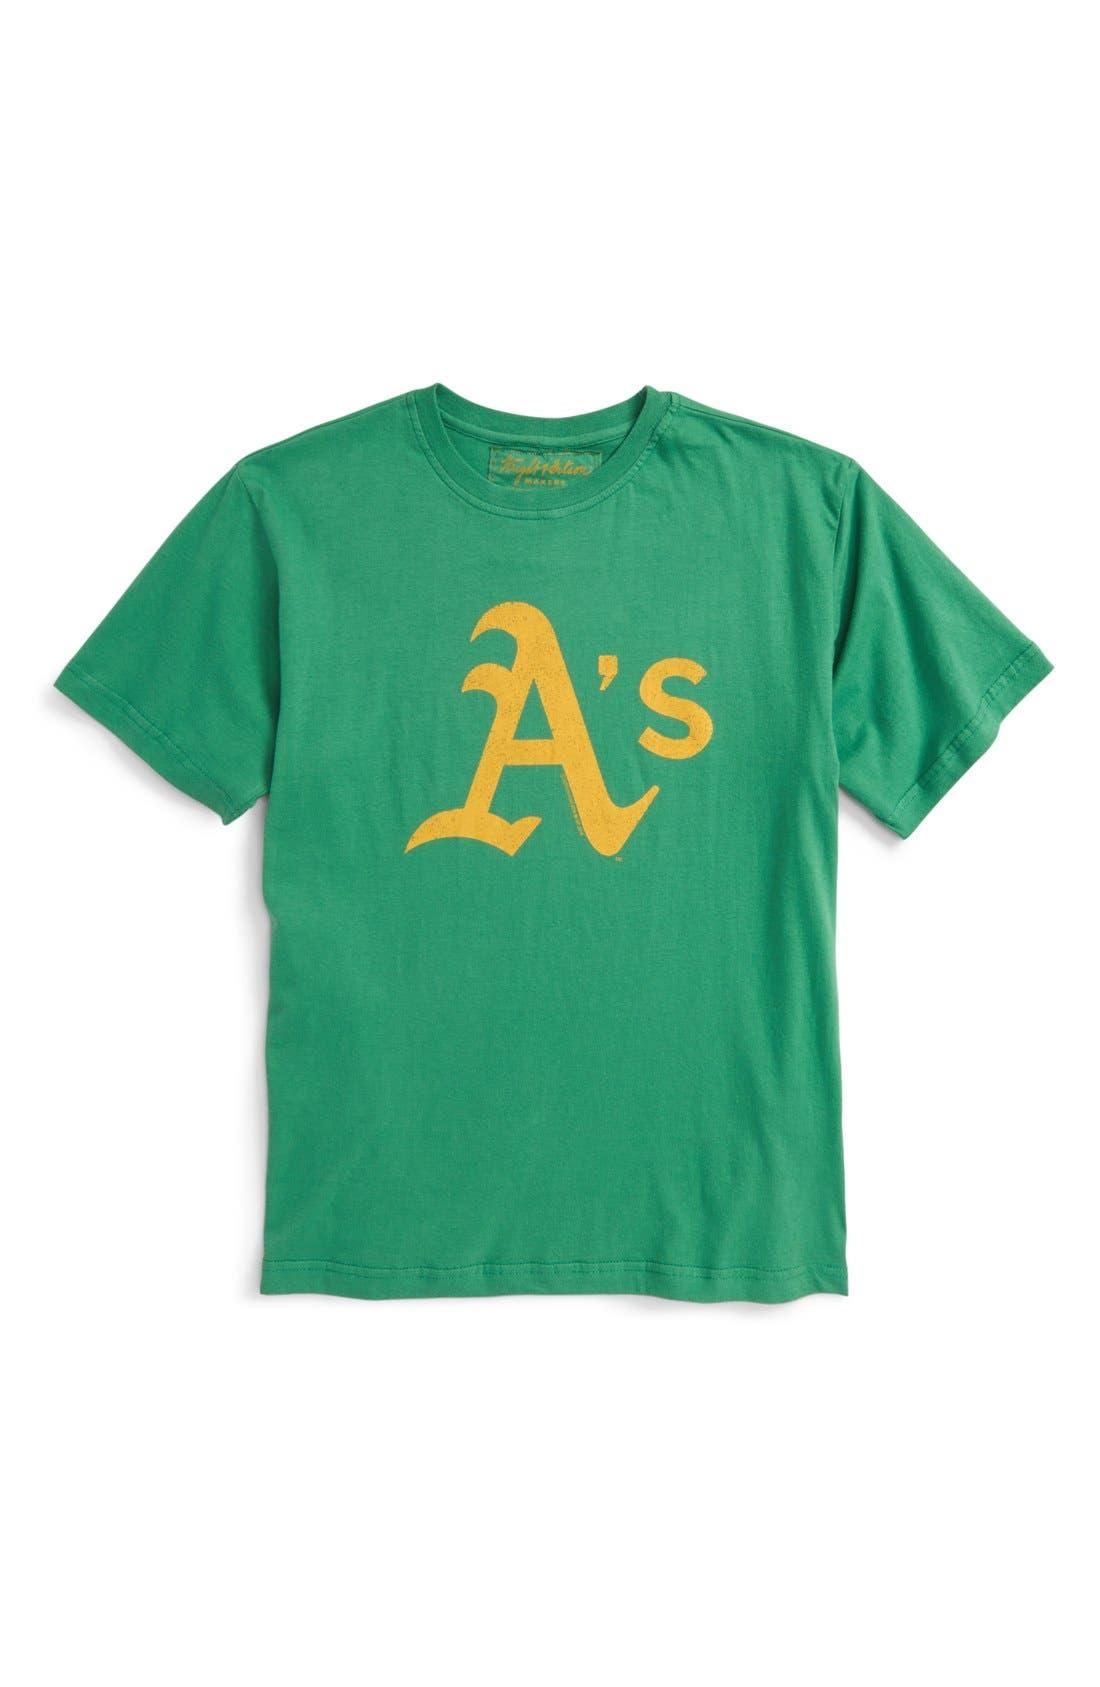 'Oakland Athletics' T-Shirt,                             Main thumbnail 1, color,                             300